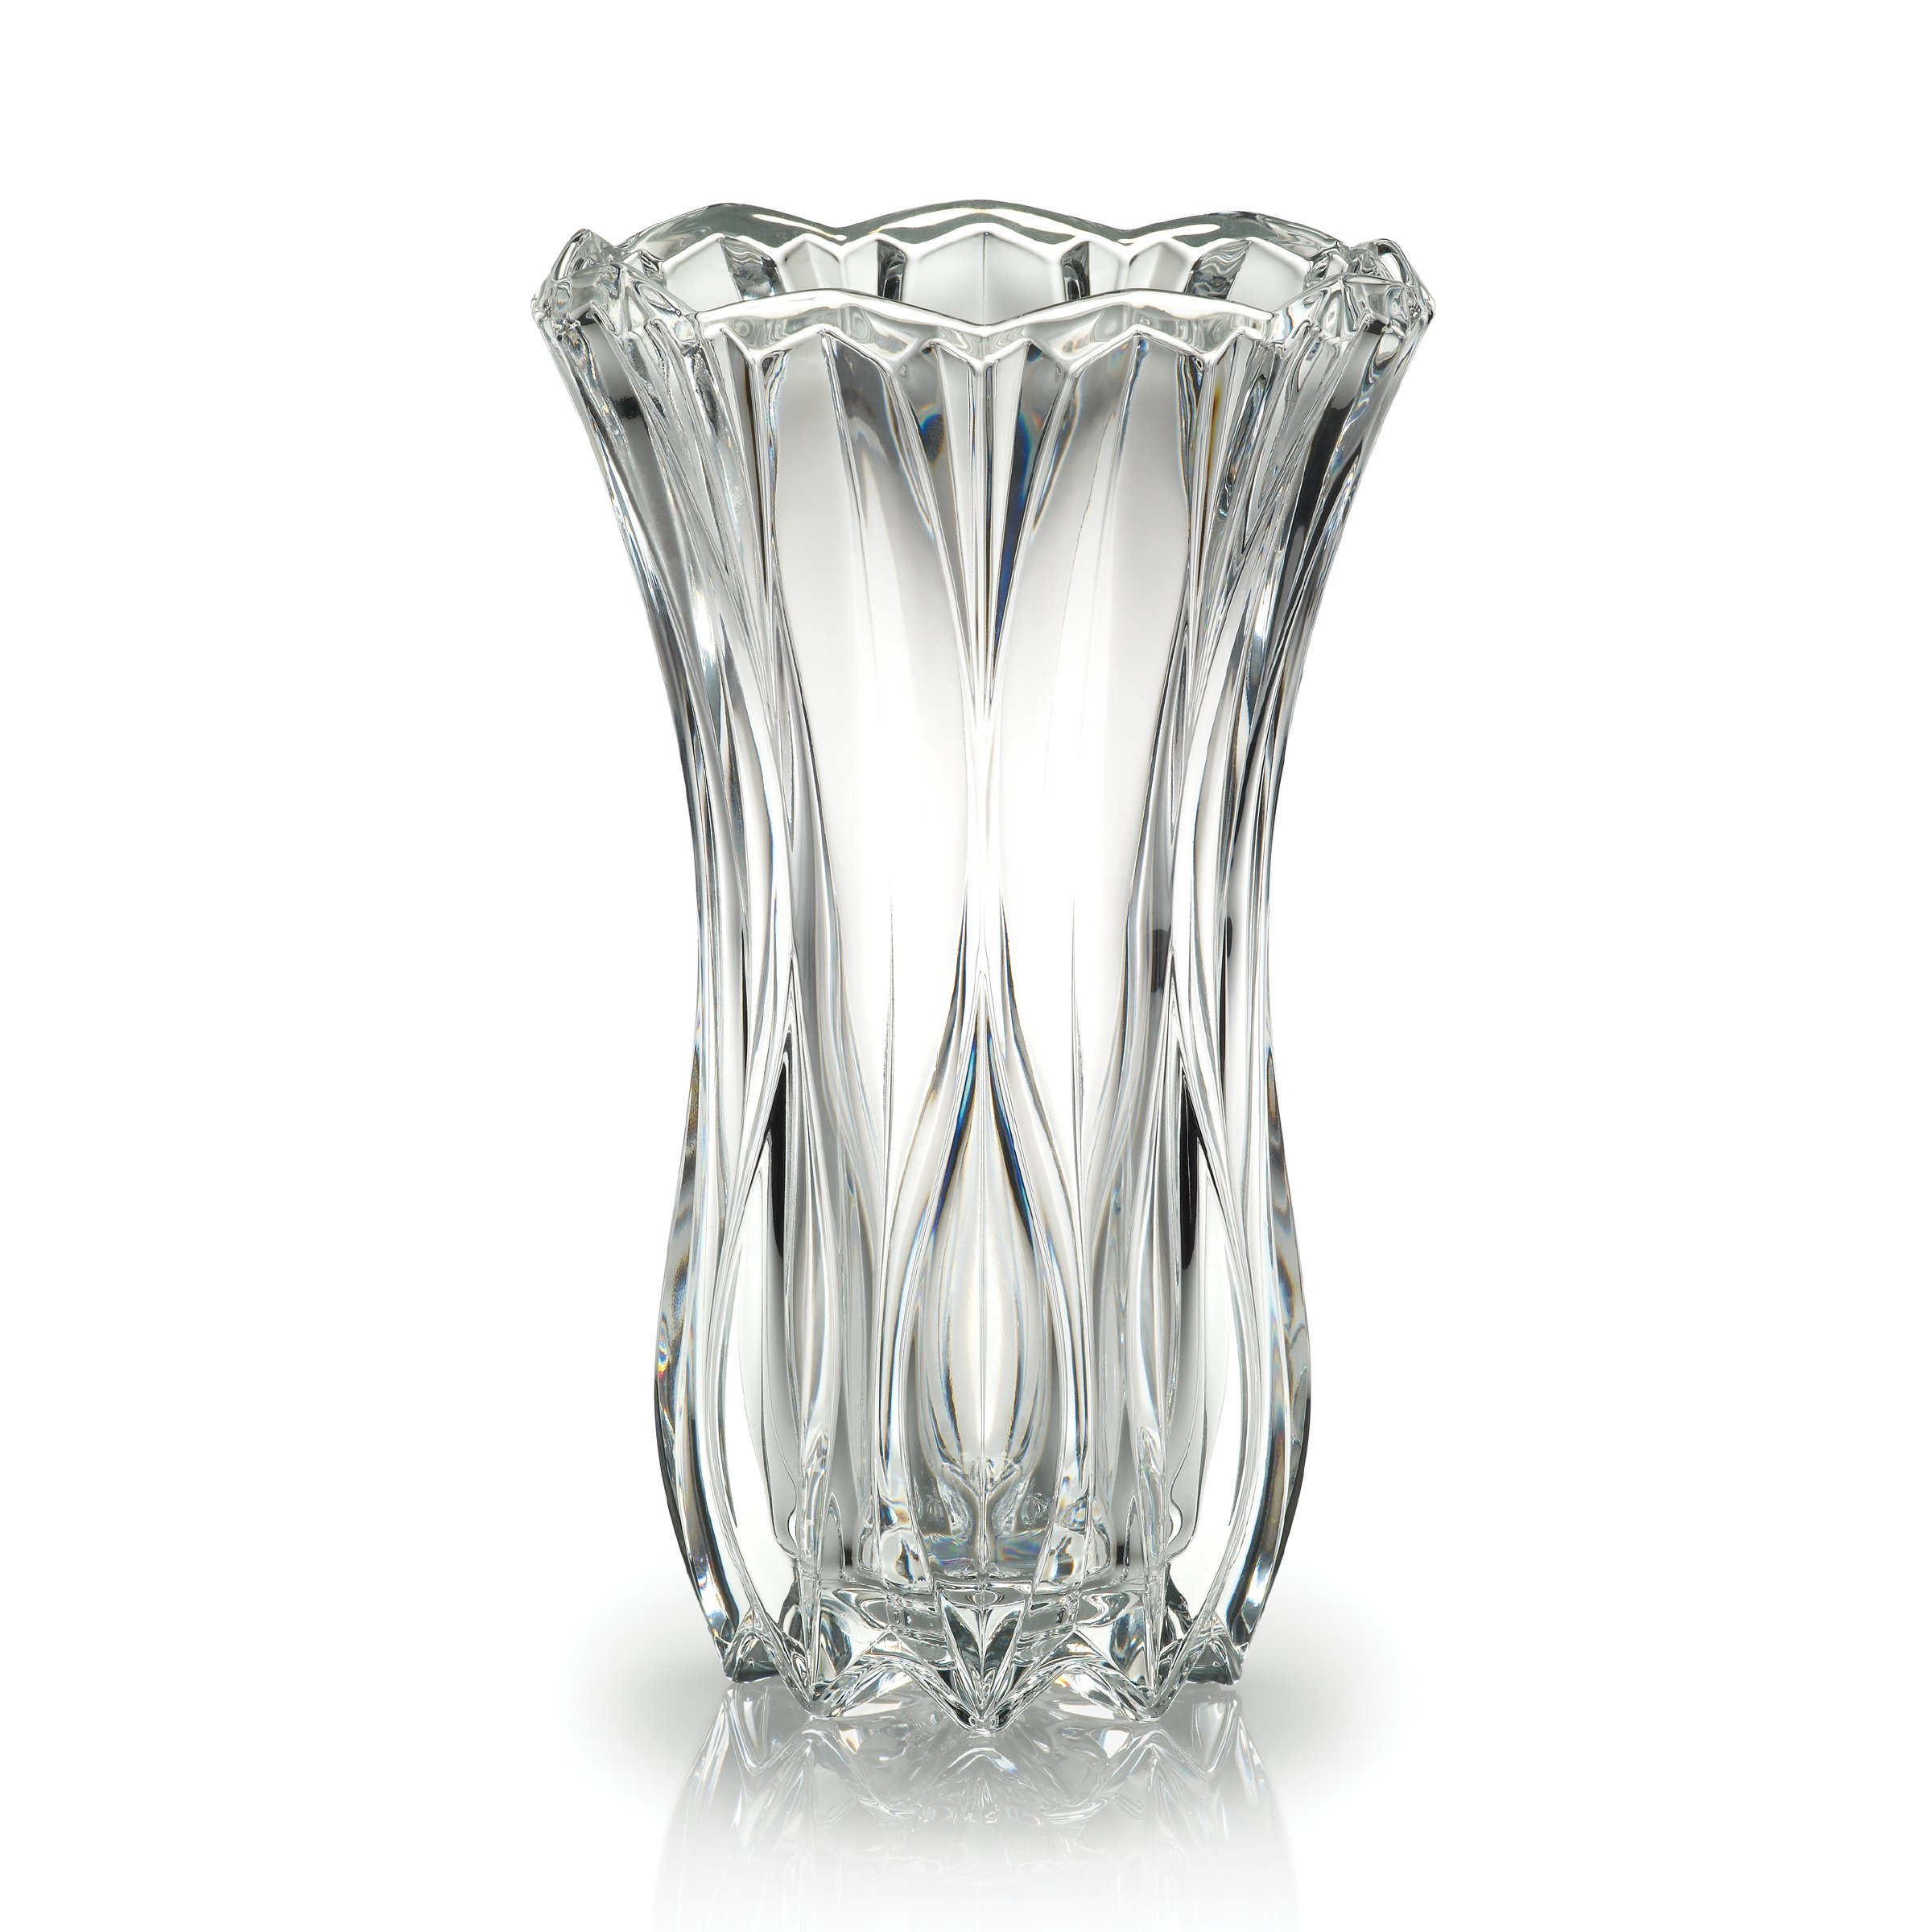 Mikasa Celebrations Blossom Crystal Vase, 12-Inch by Mikasa